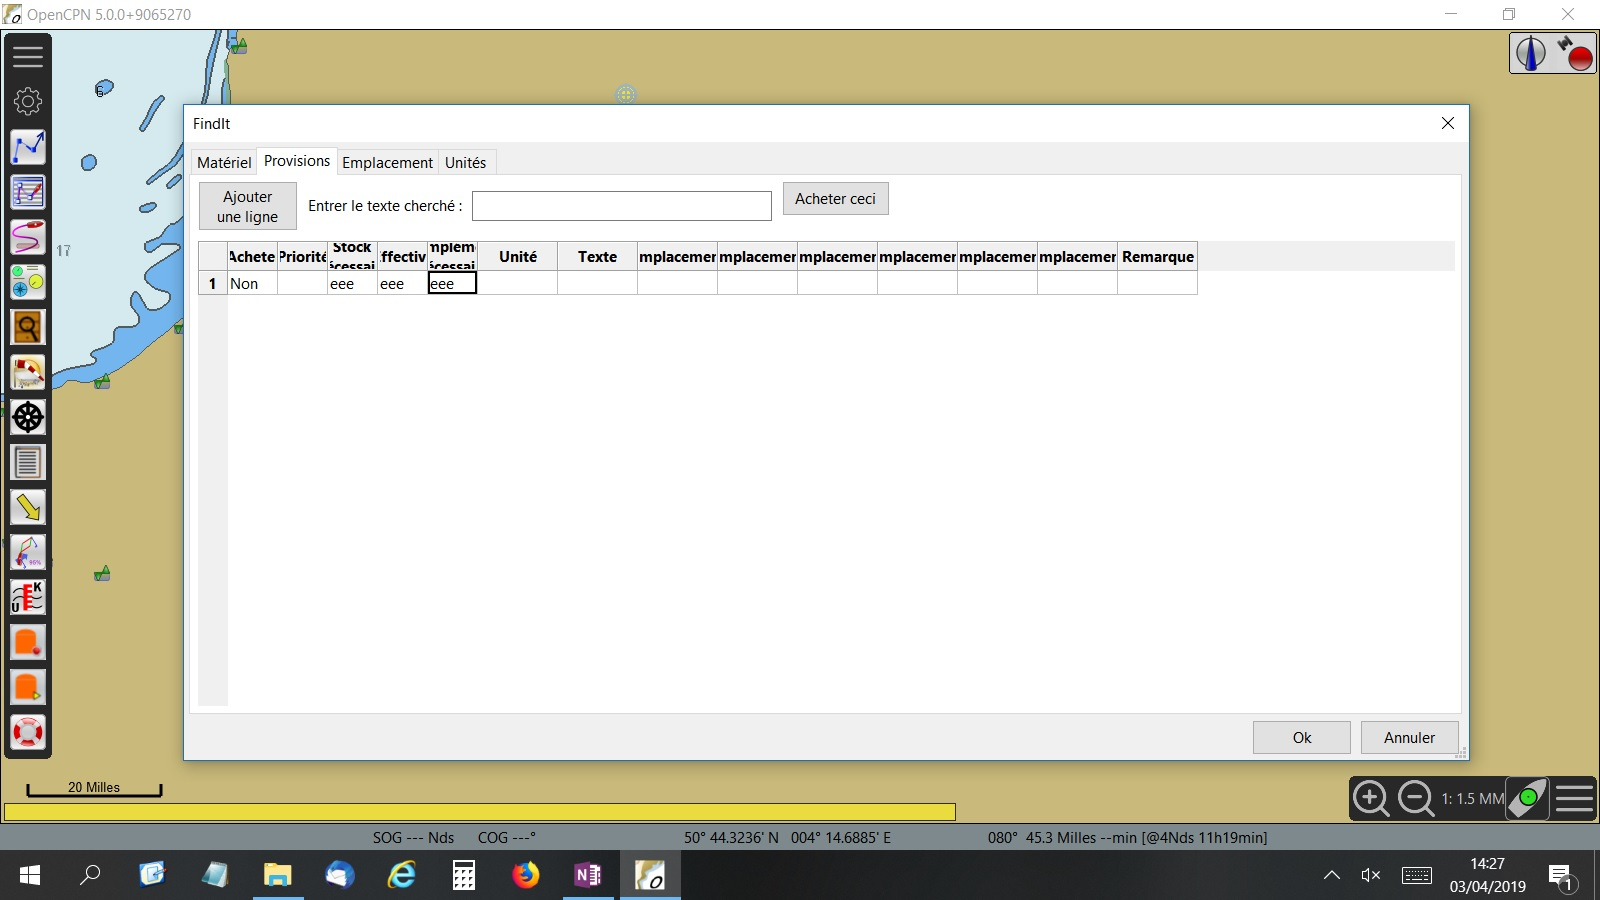 Click image for larger version  Name:OCN5_FINDIT.jpg Views:18 Size:184.6 KB ID:189277